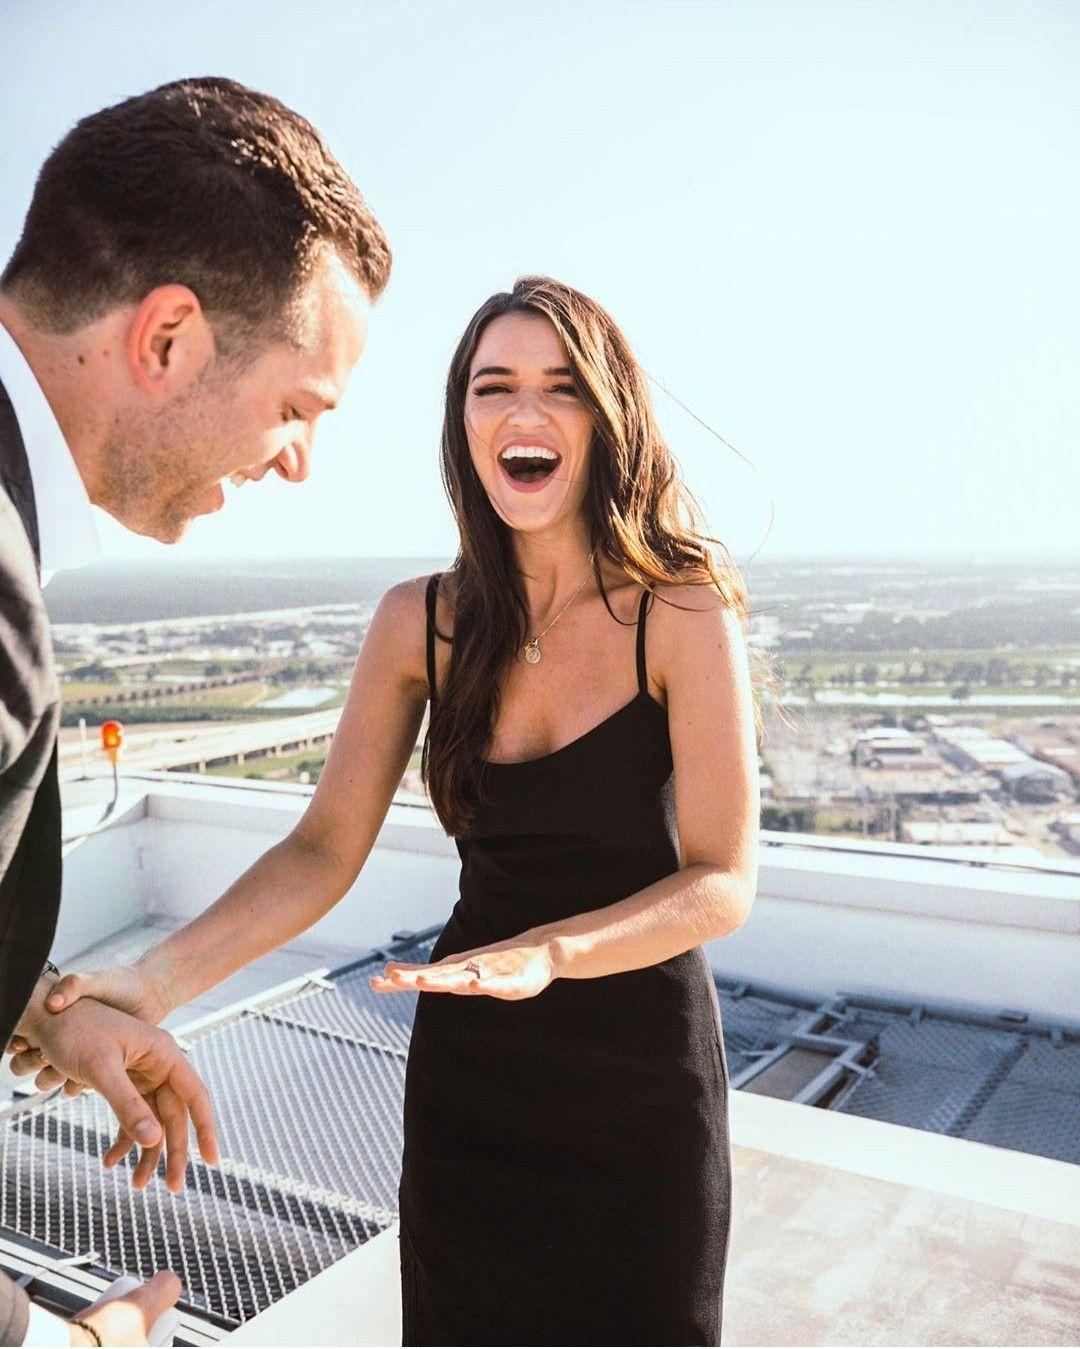 Bachelor In Paradise Season 4 Raven Gates and Adam Gottschalk Engagement   Bachelor nation, Bachelor, Bachelorette